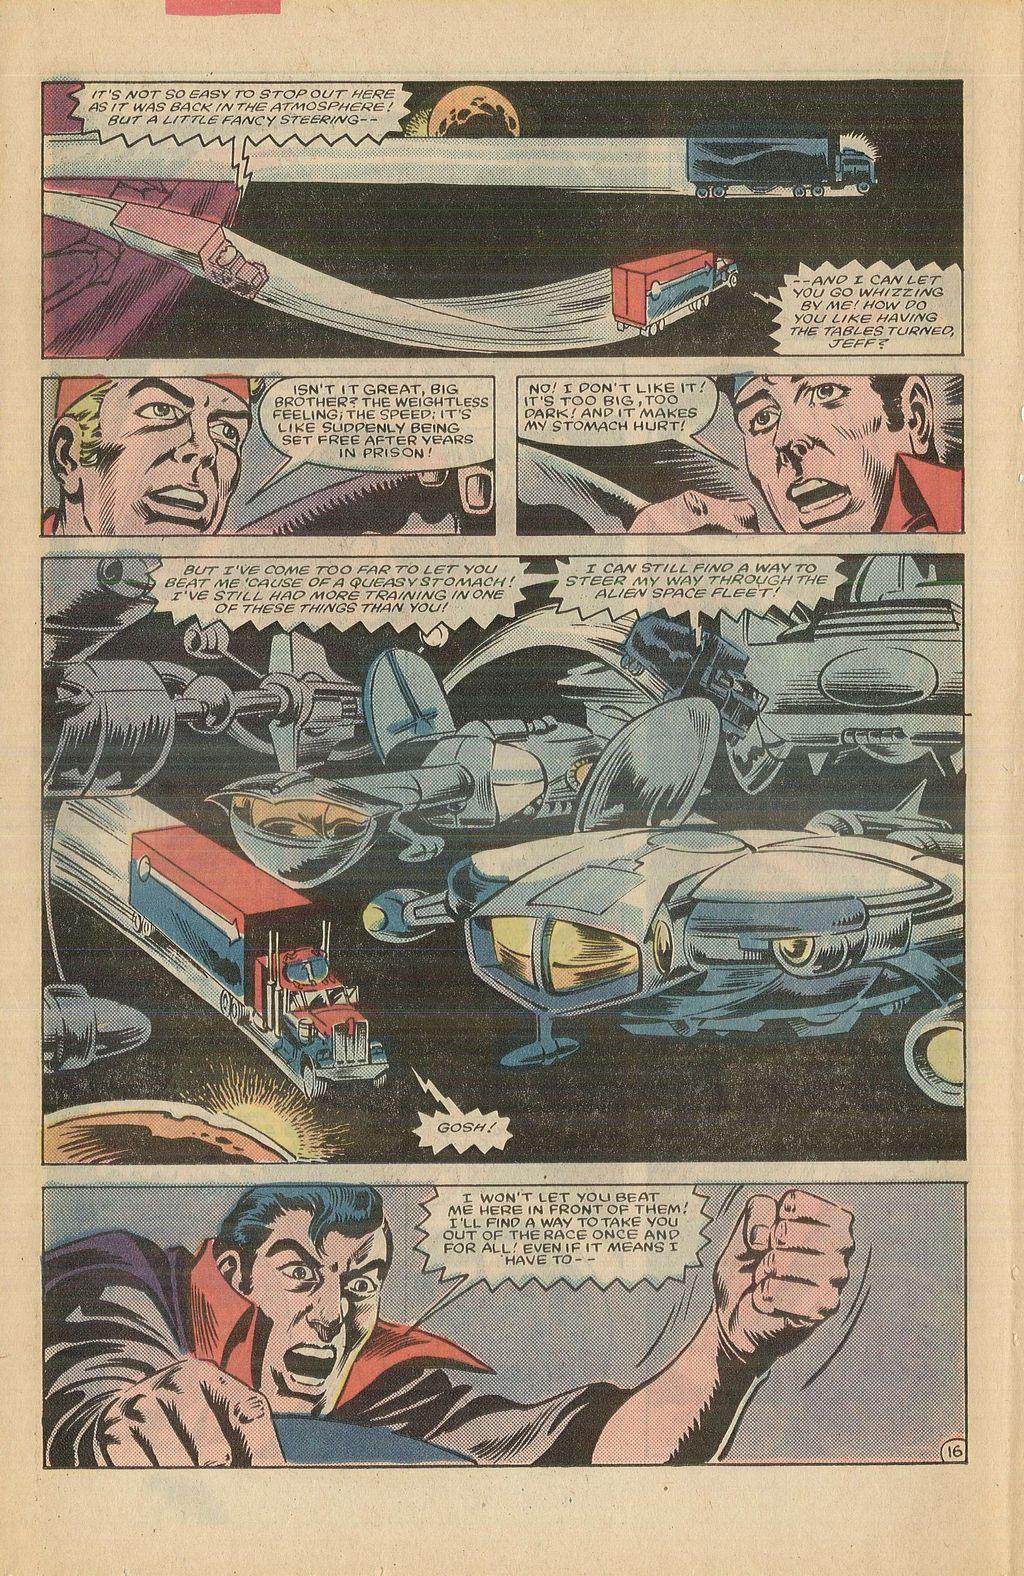 Read online U.S. 1 comic -  Issue #12 - 22